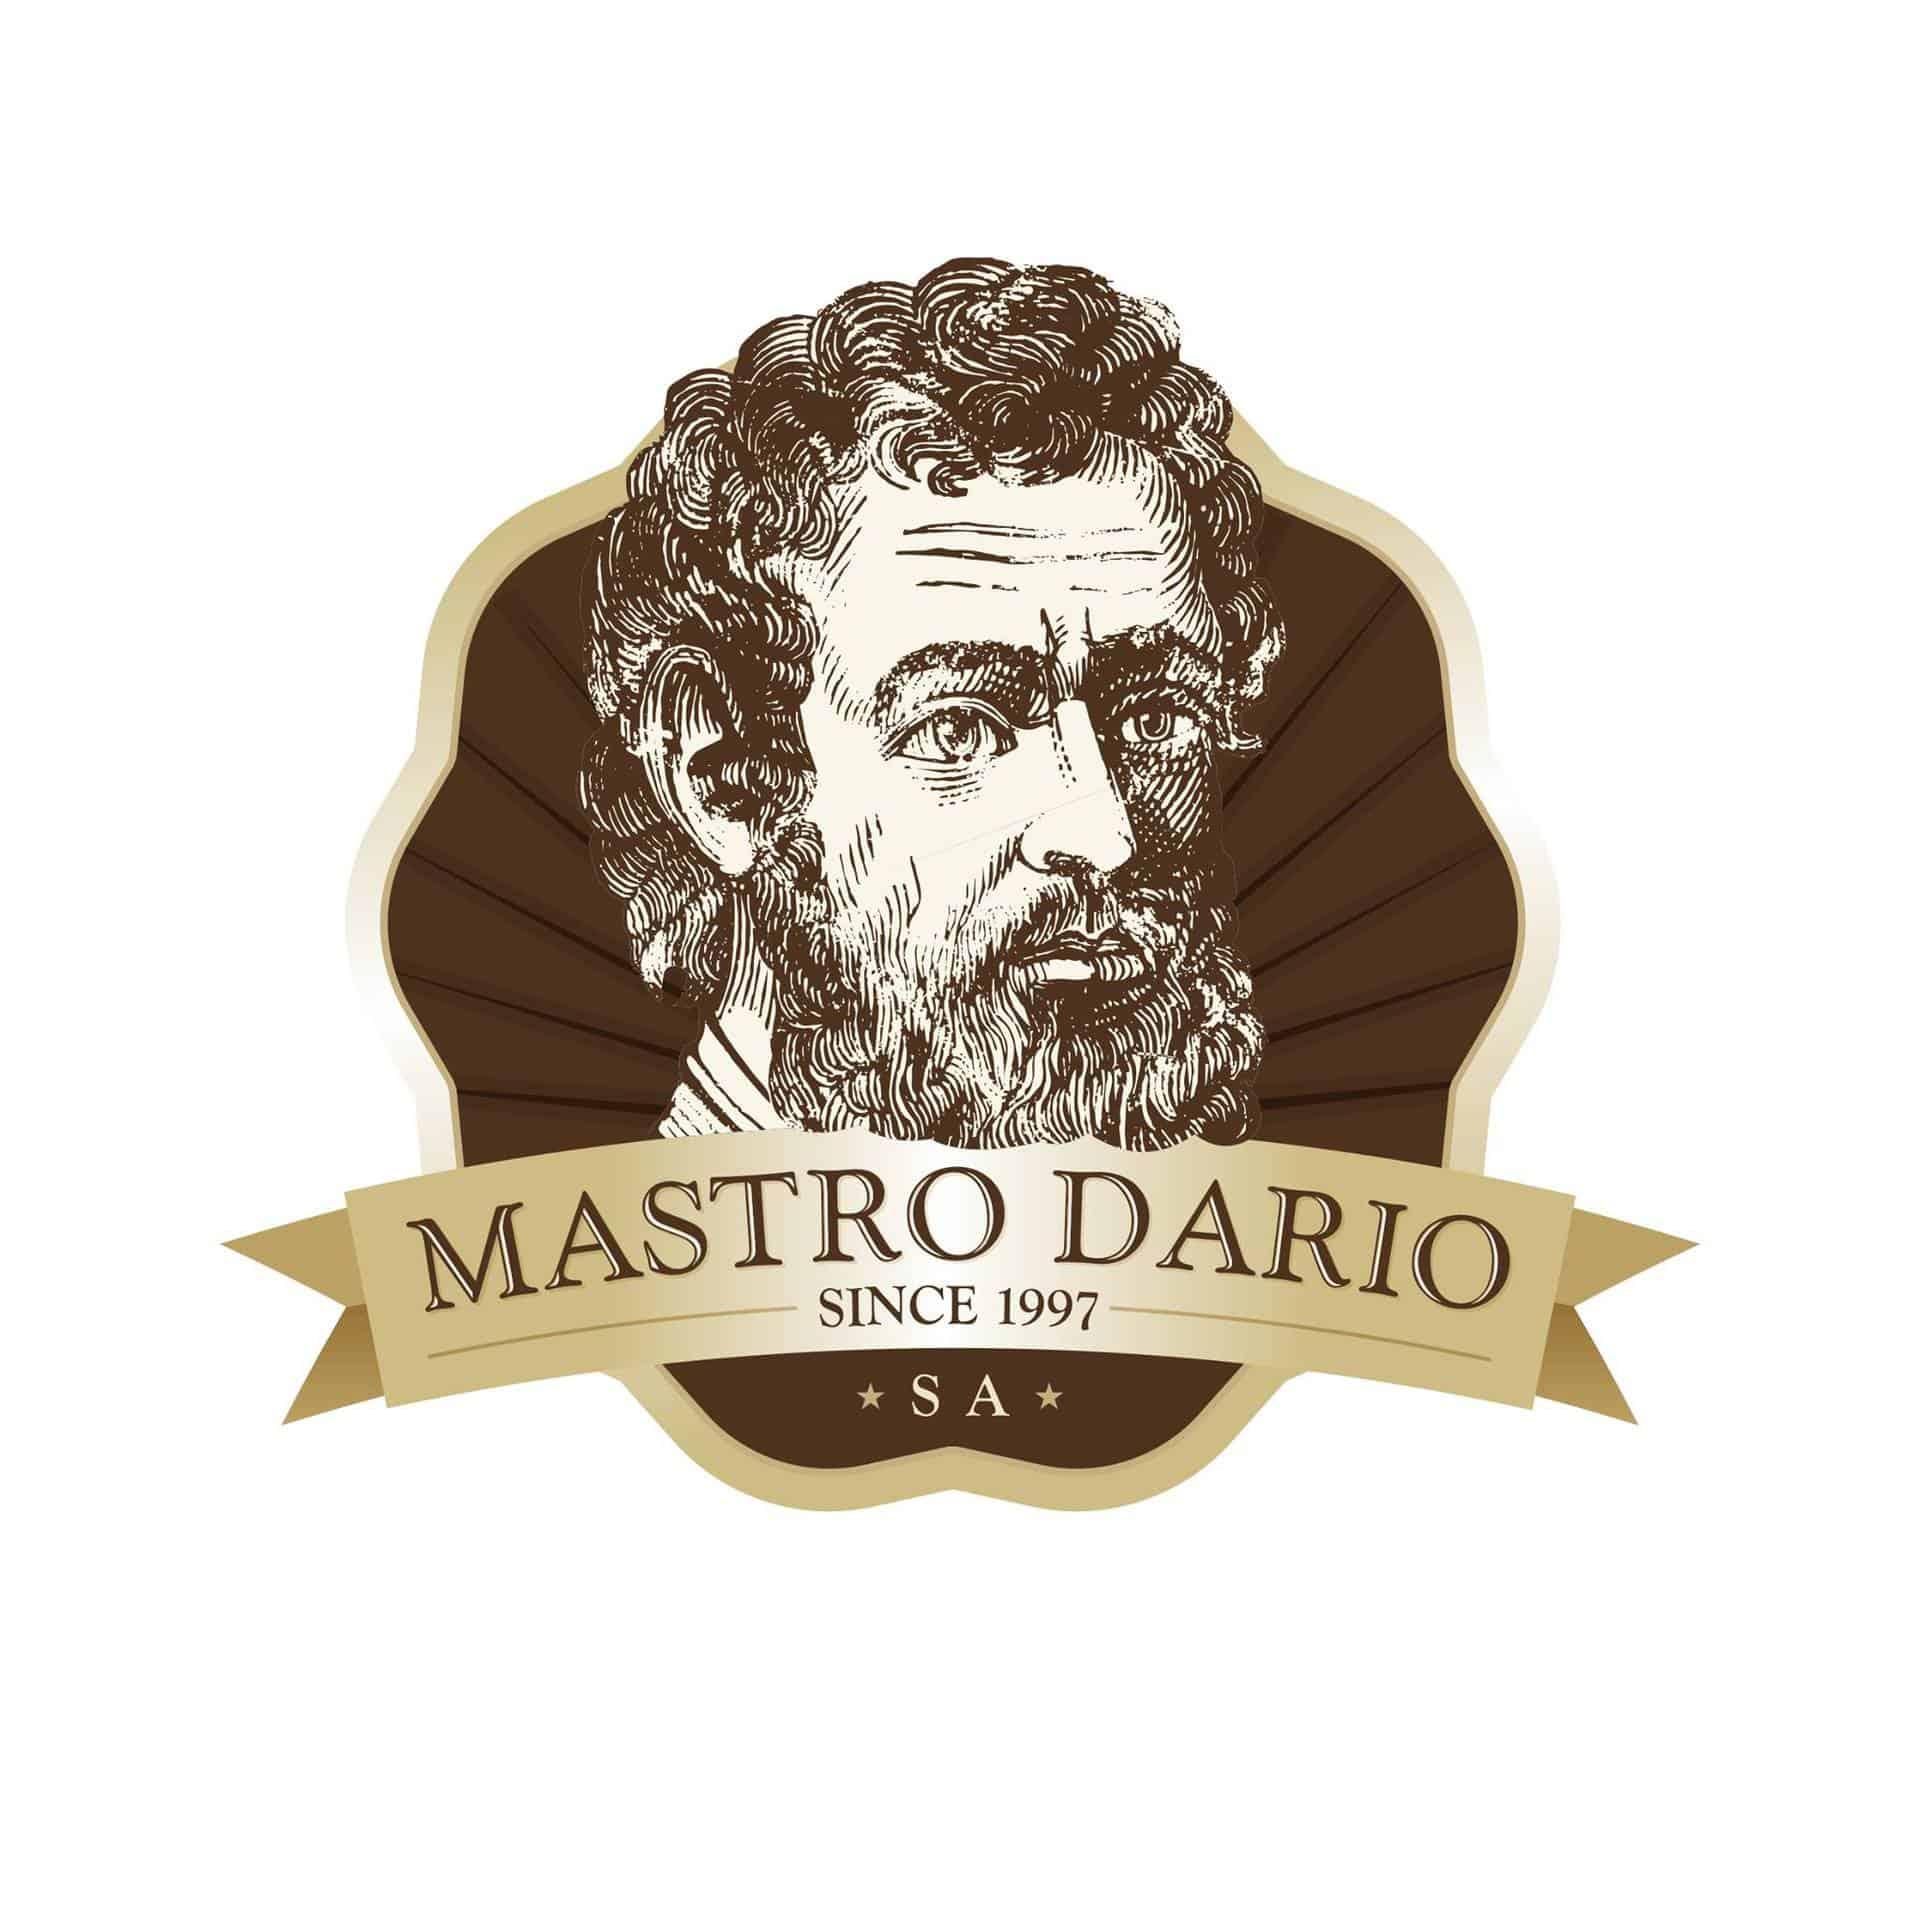 Mastro Dario